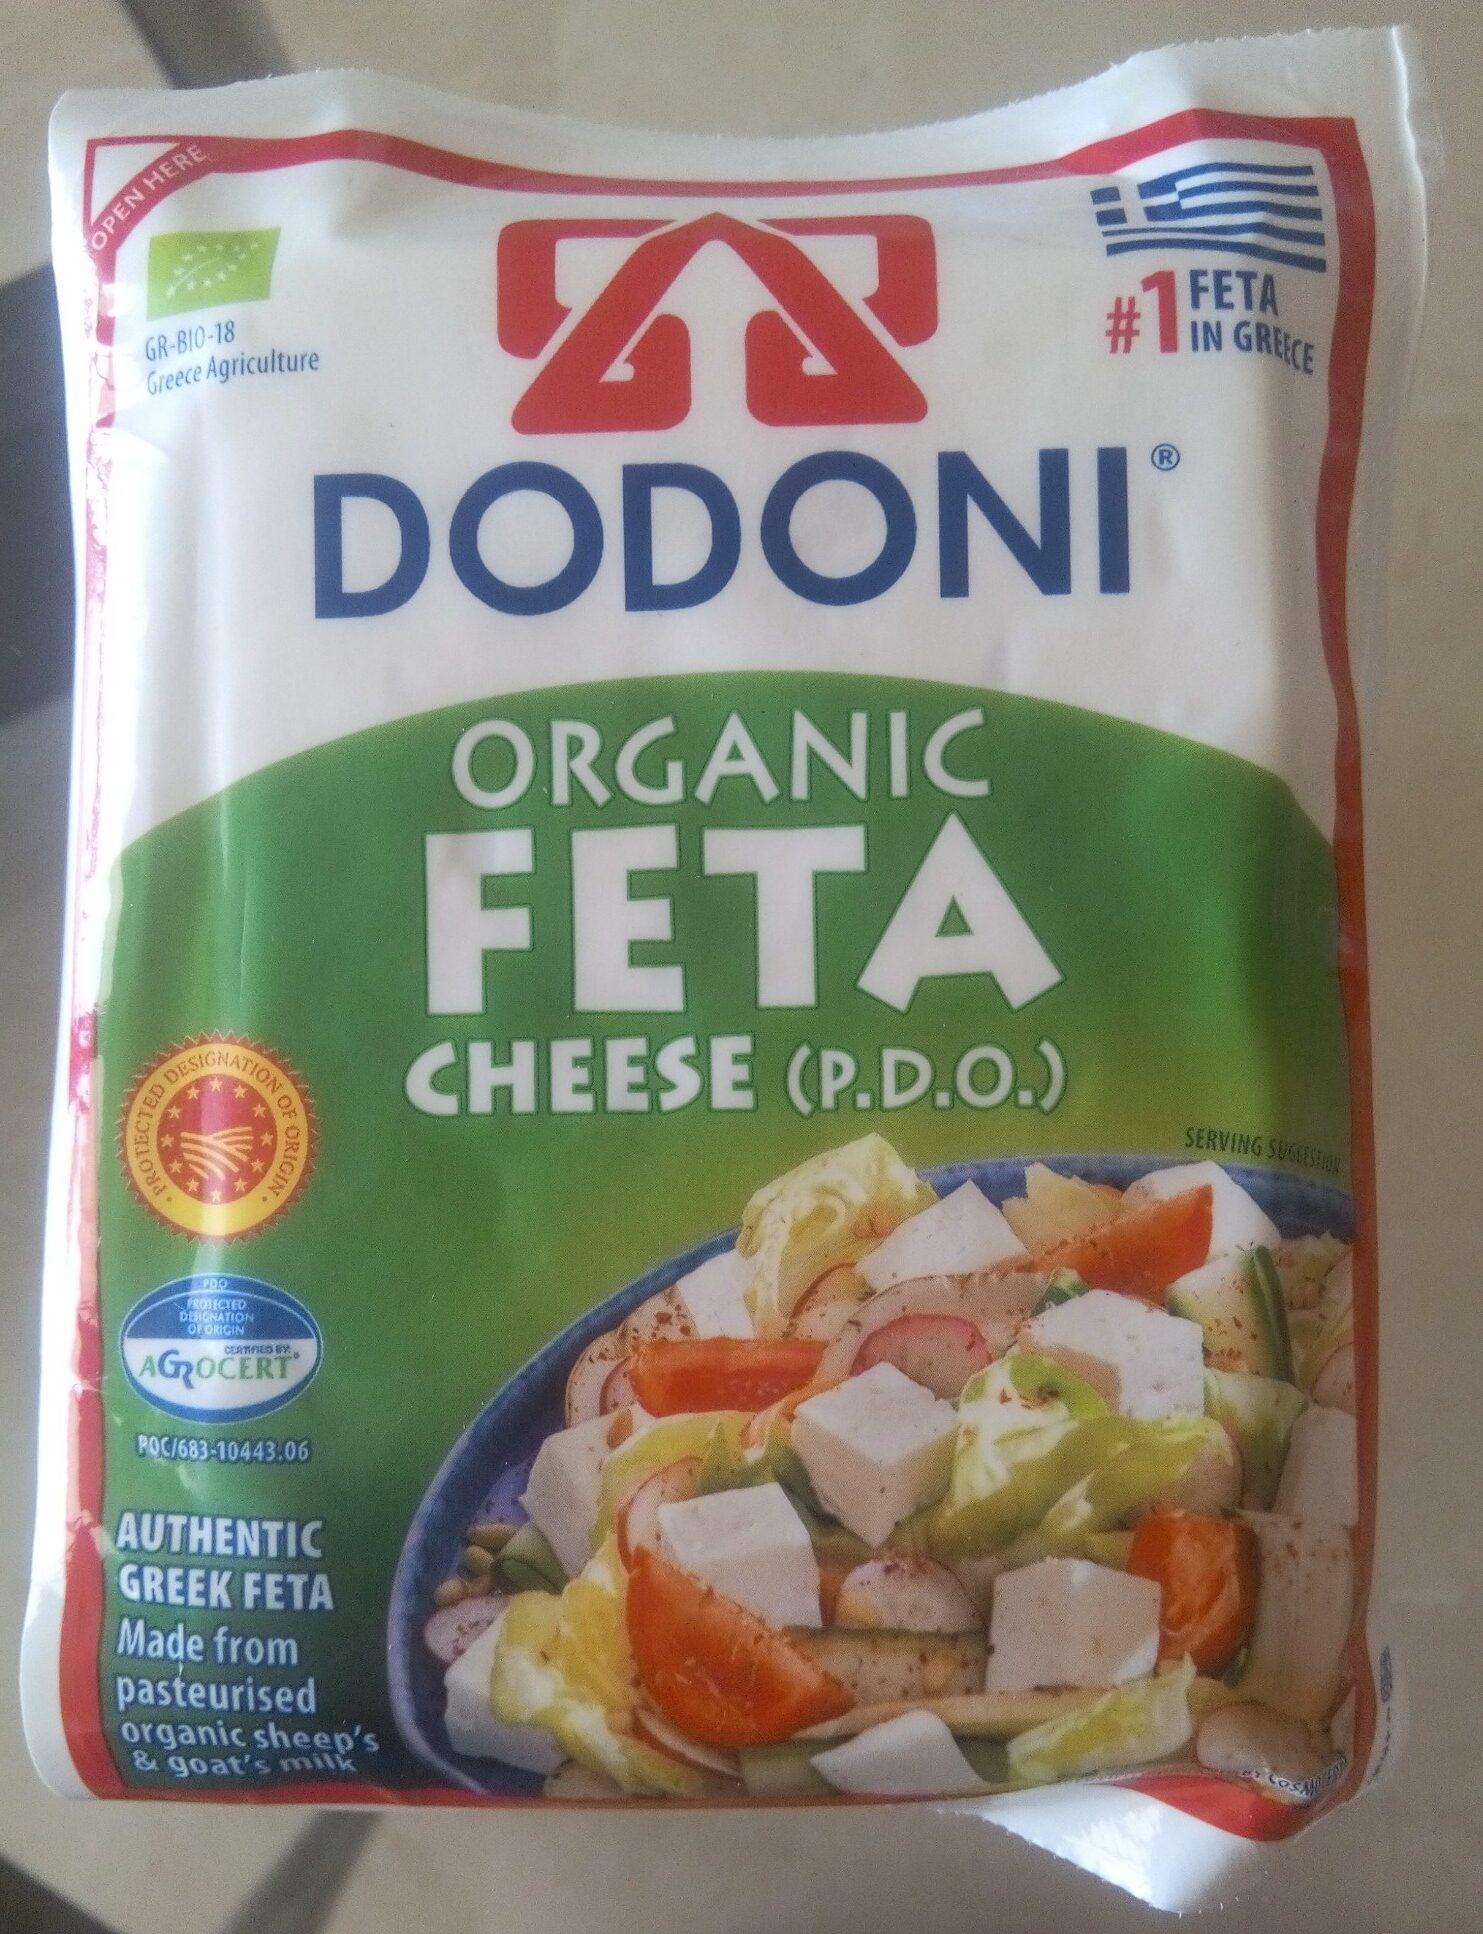 Dodoni Organic Feta Cheese 200G - Producte - es